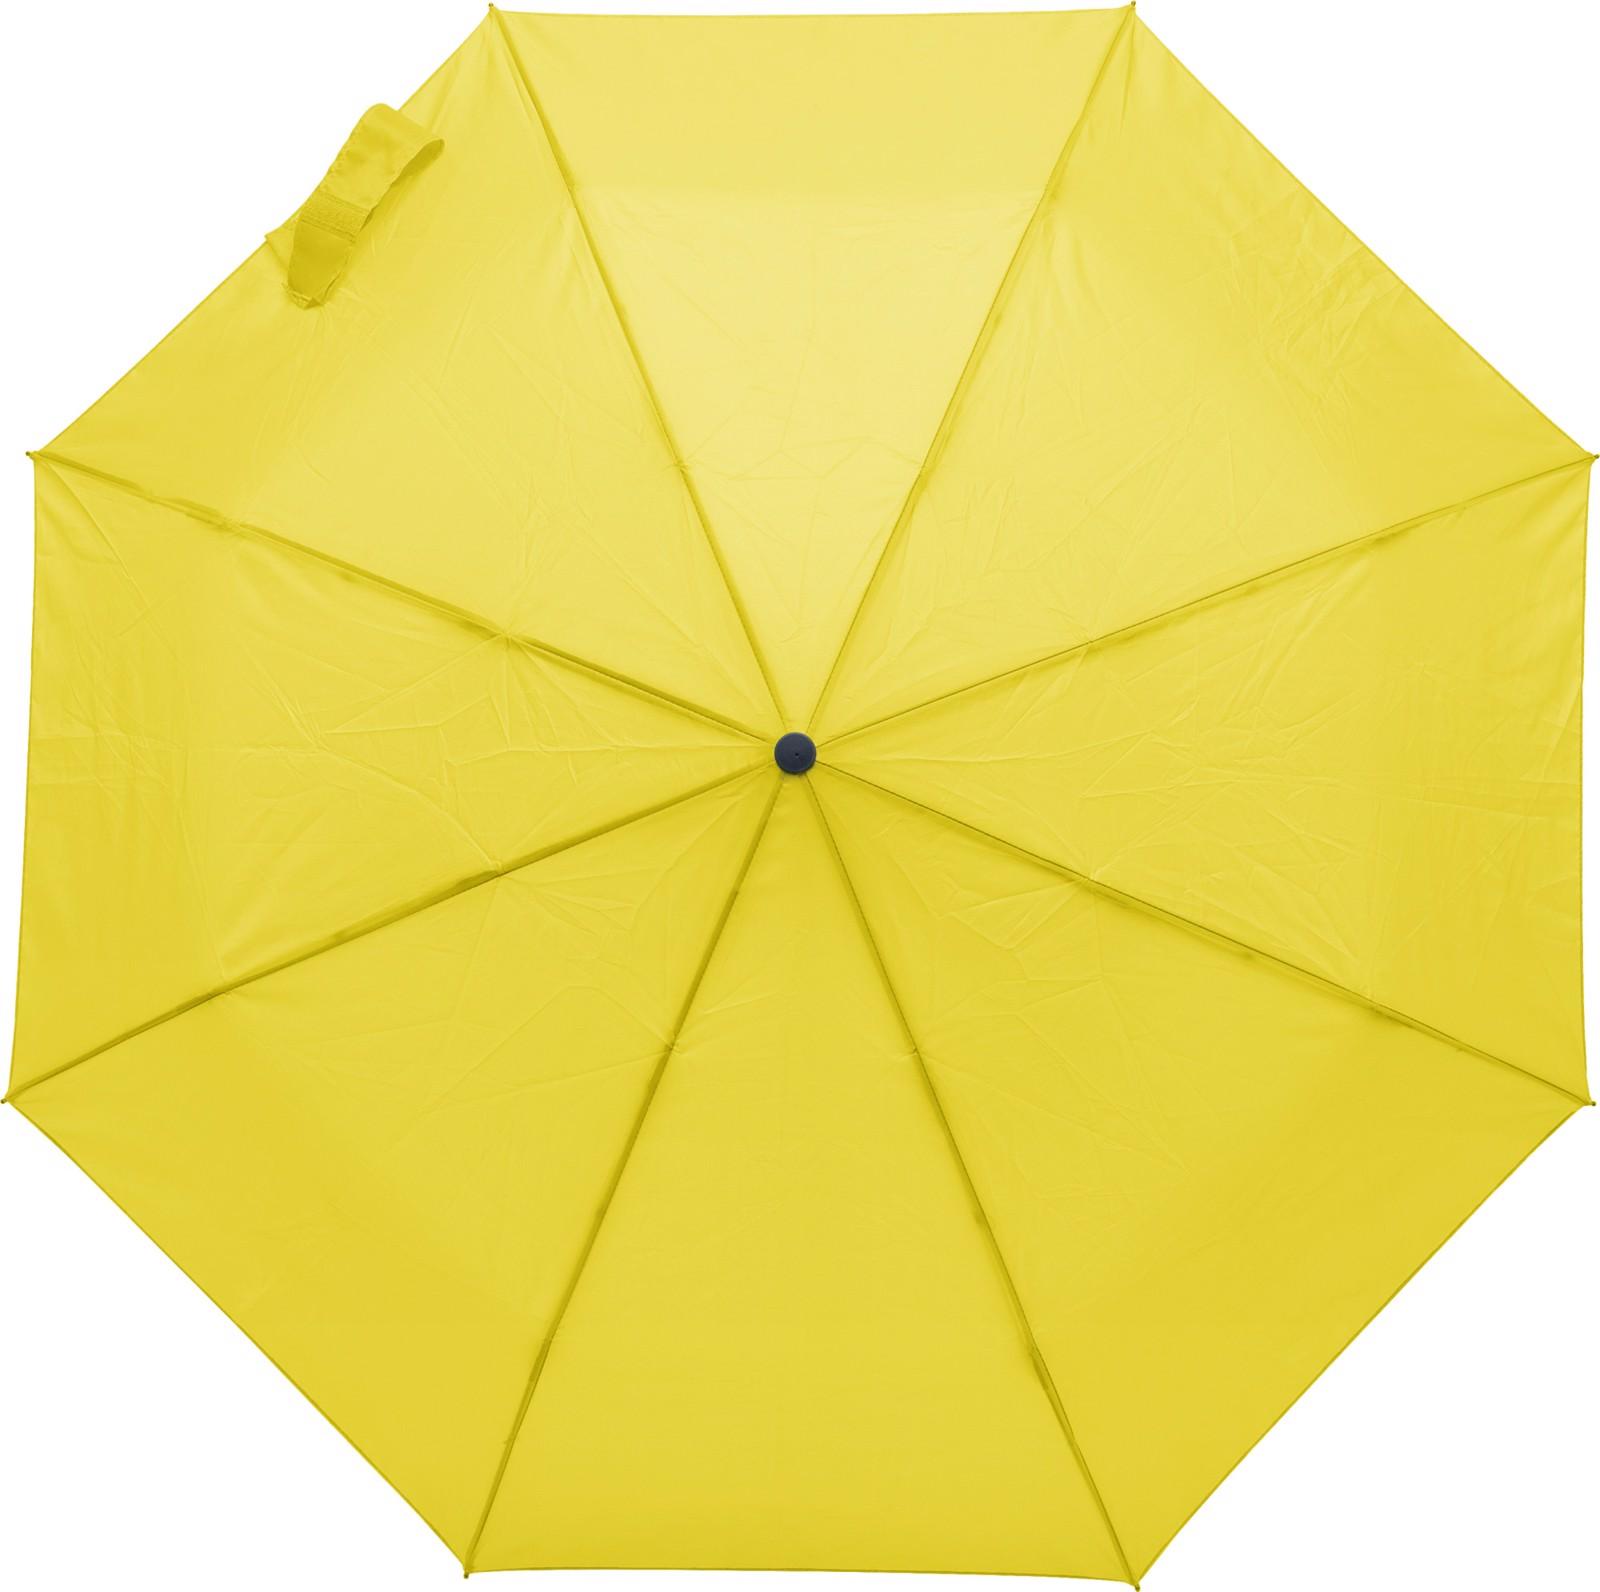 Polyester (170T) umbrella - Yellow